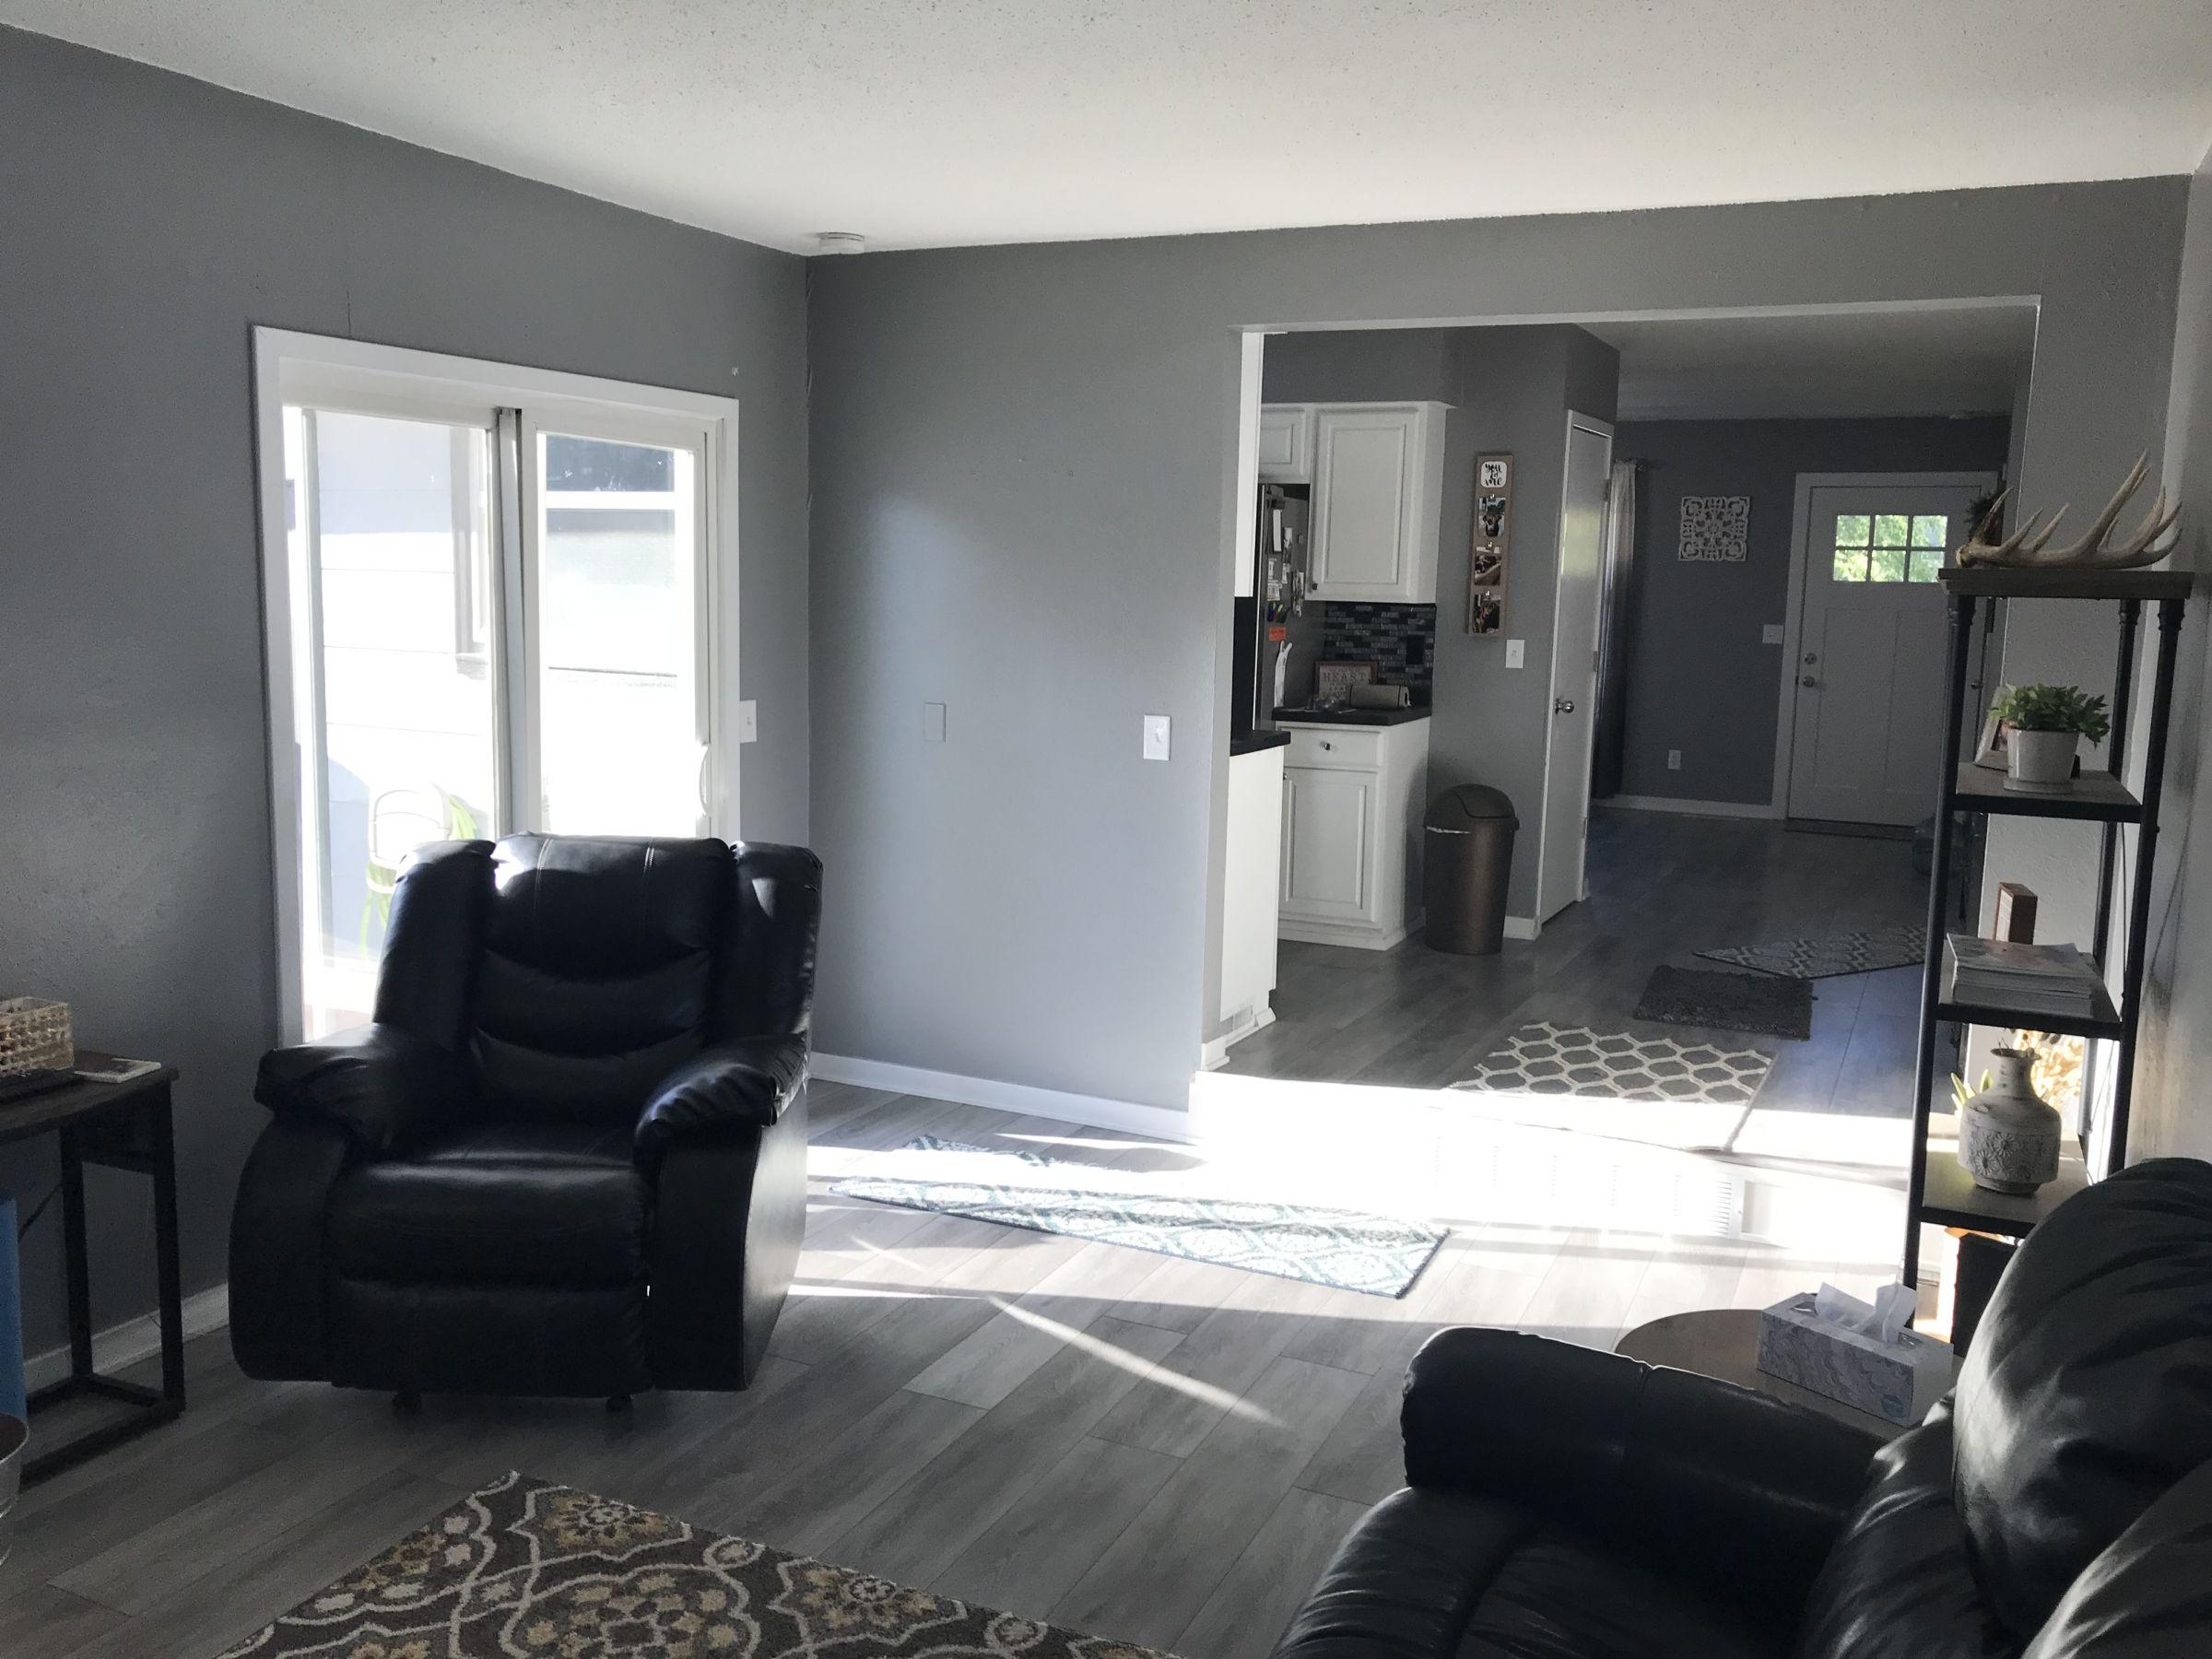 residential-warren-county-iowa-0-acres-listing-number-15778-3-2021-09-28-155337.JPG